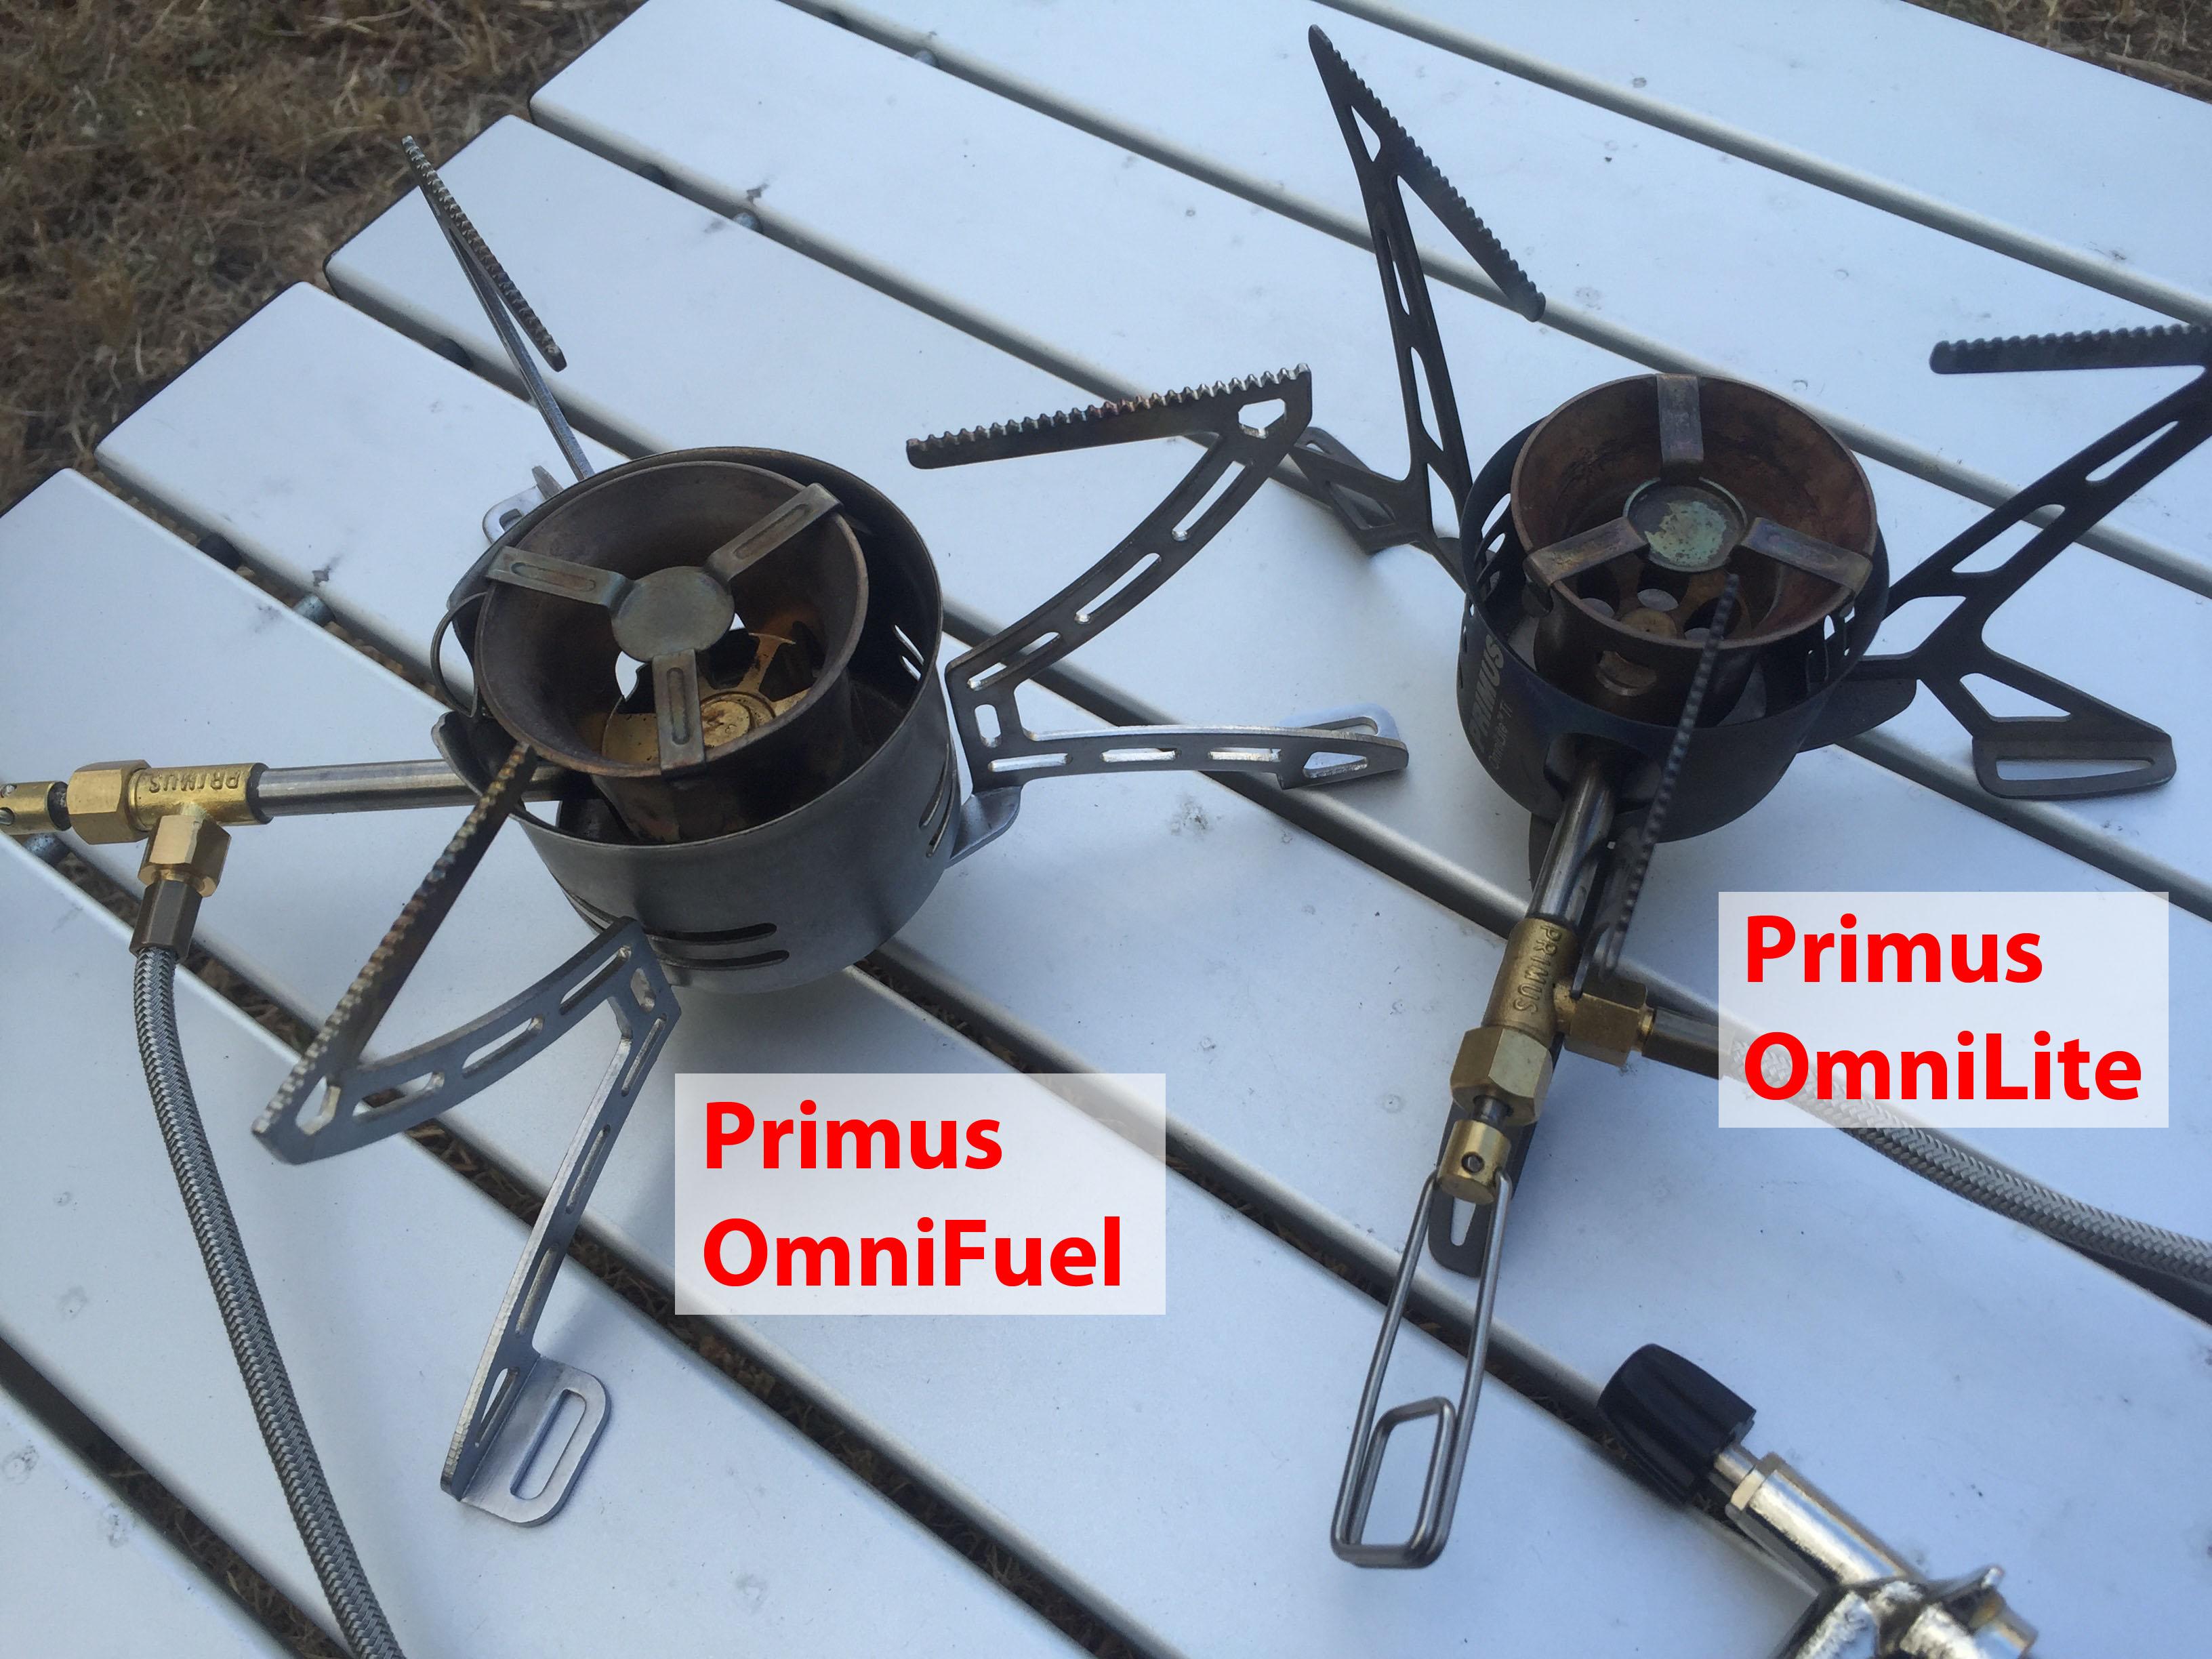 Primus Pre-Warming Pad for Primus Cookers